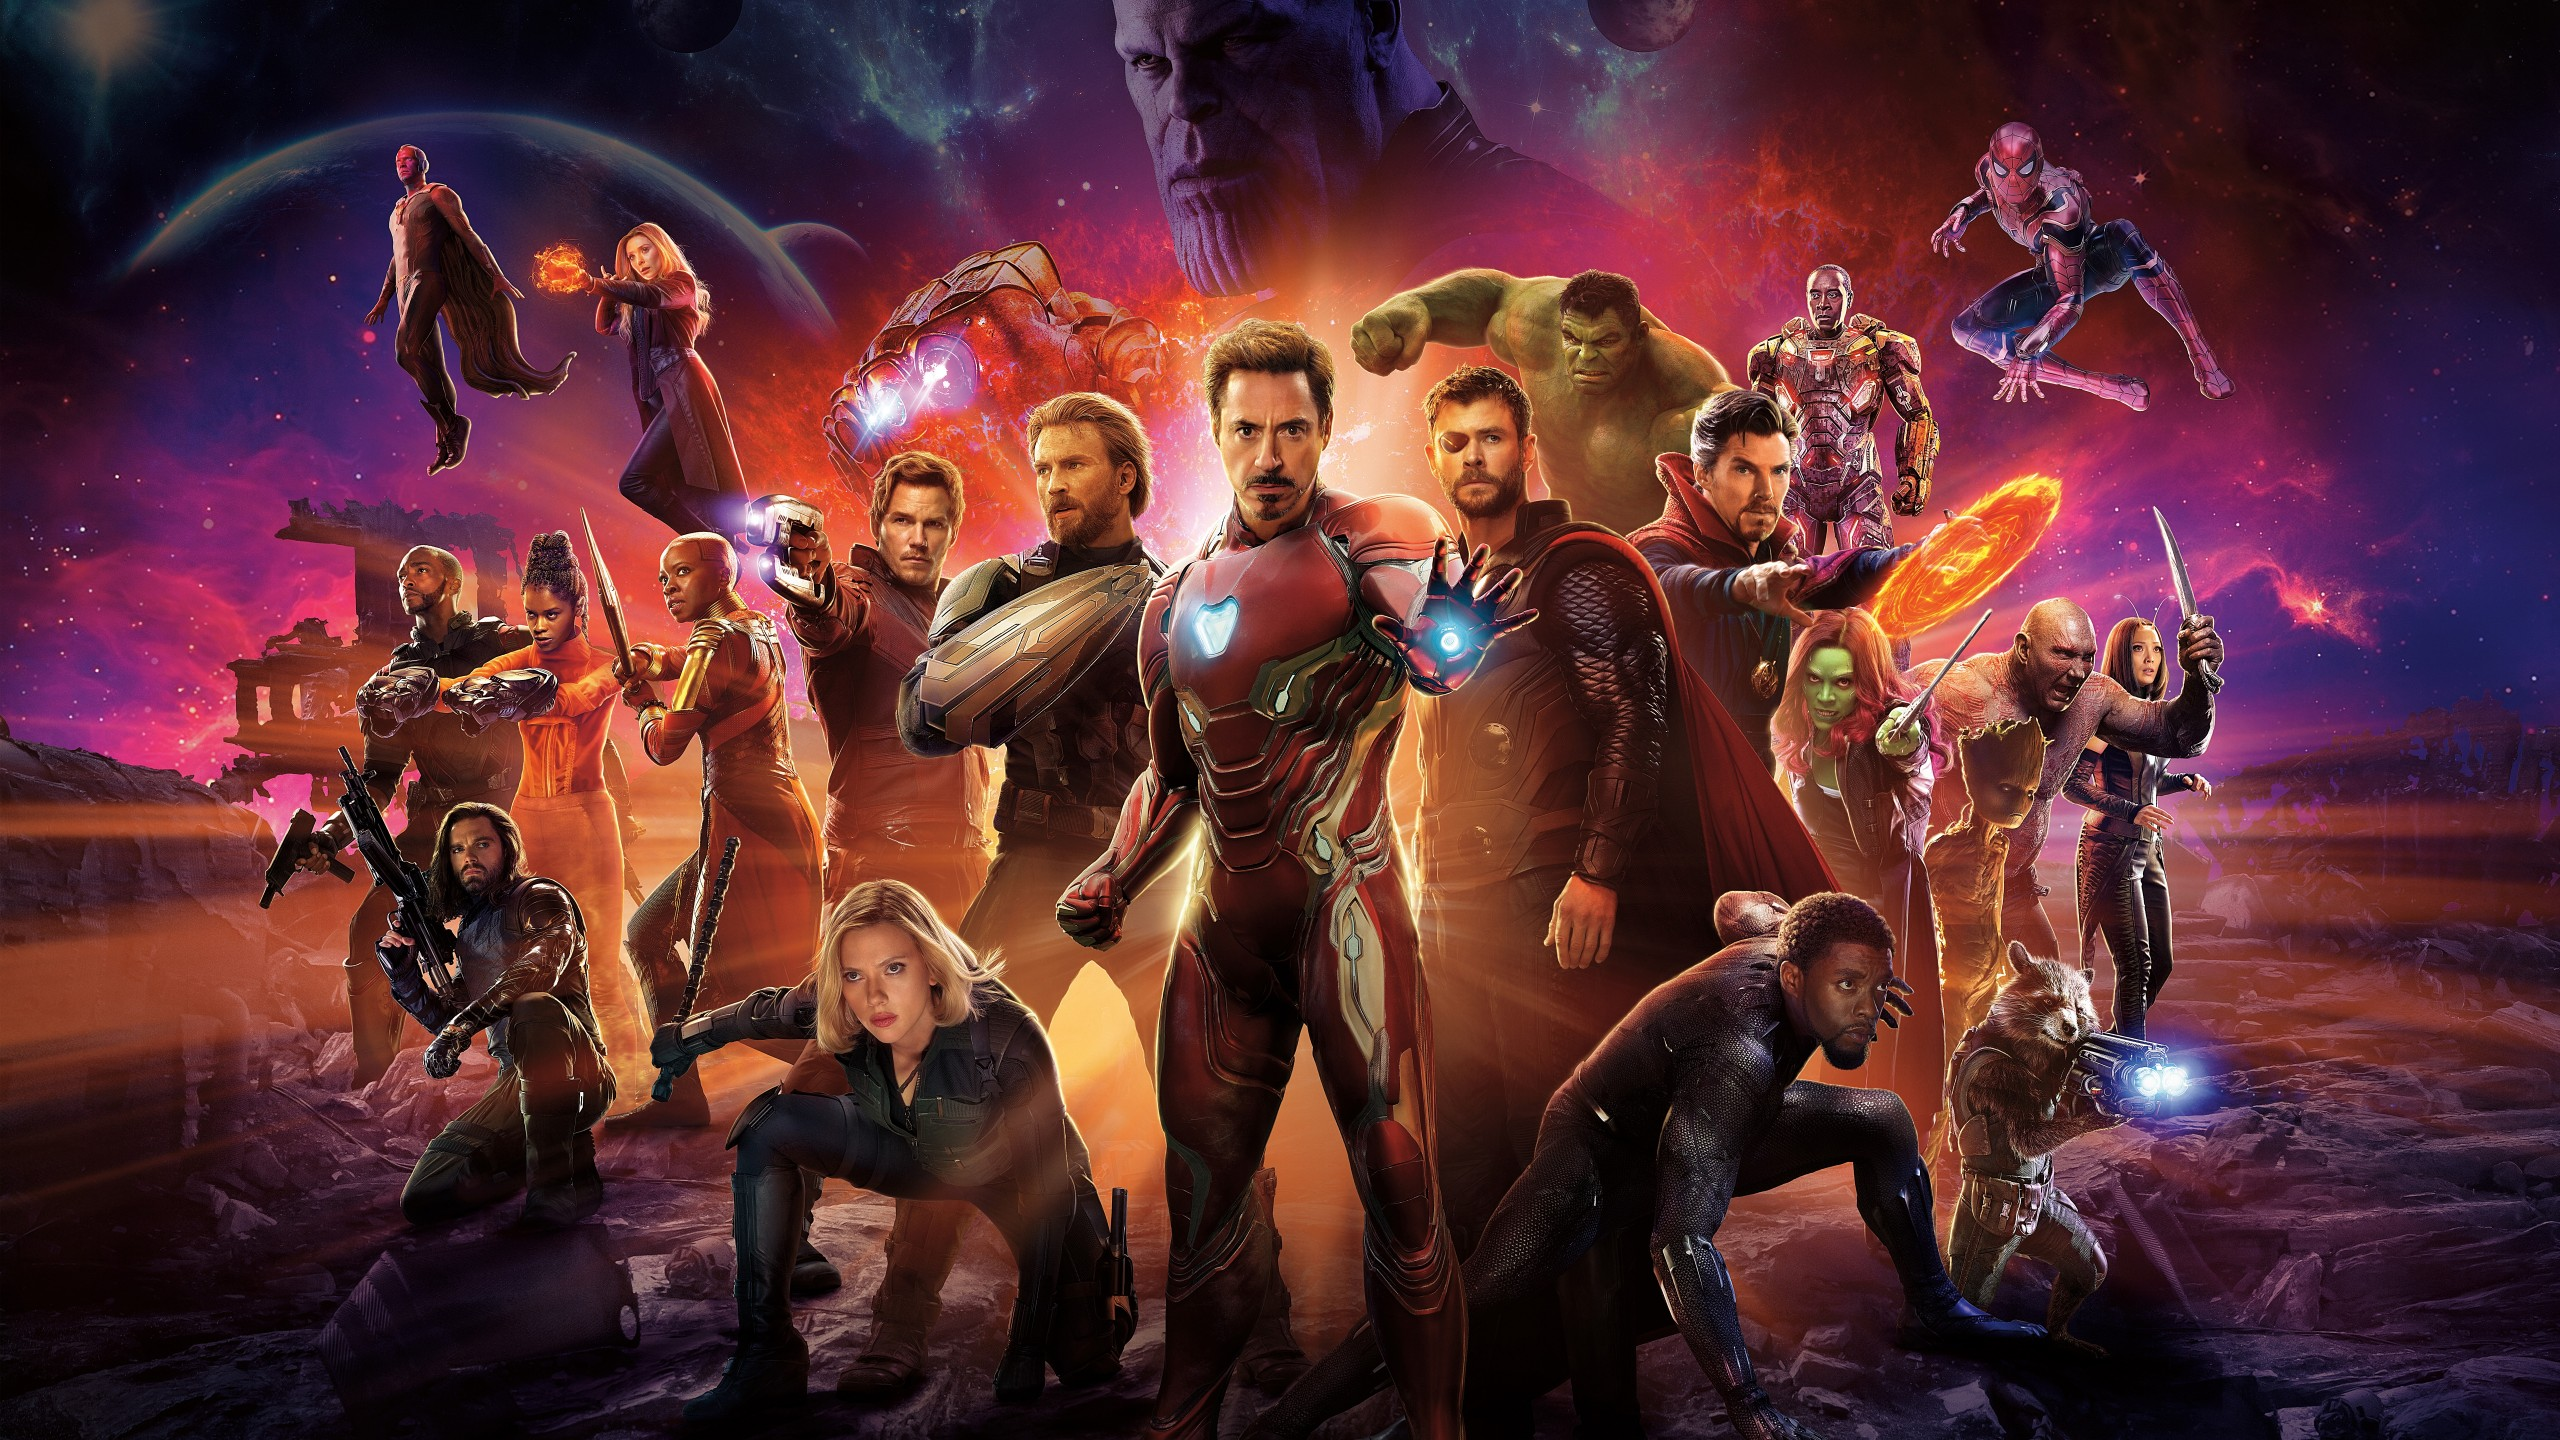 Superman Hd Iphone Wallpaper Avengers Infinity War Superheroes Cast 4k 8k Wallpapers